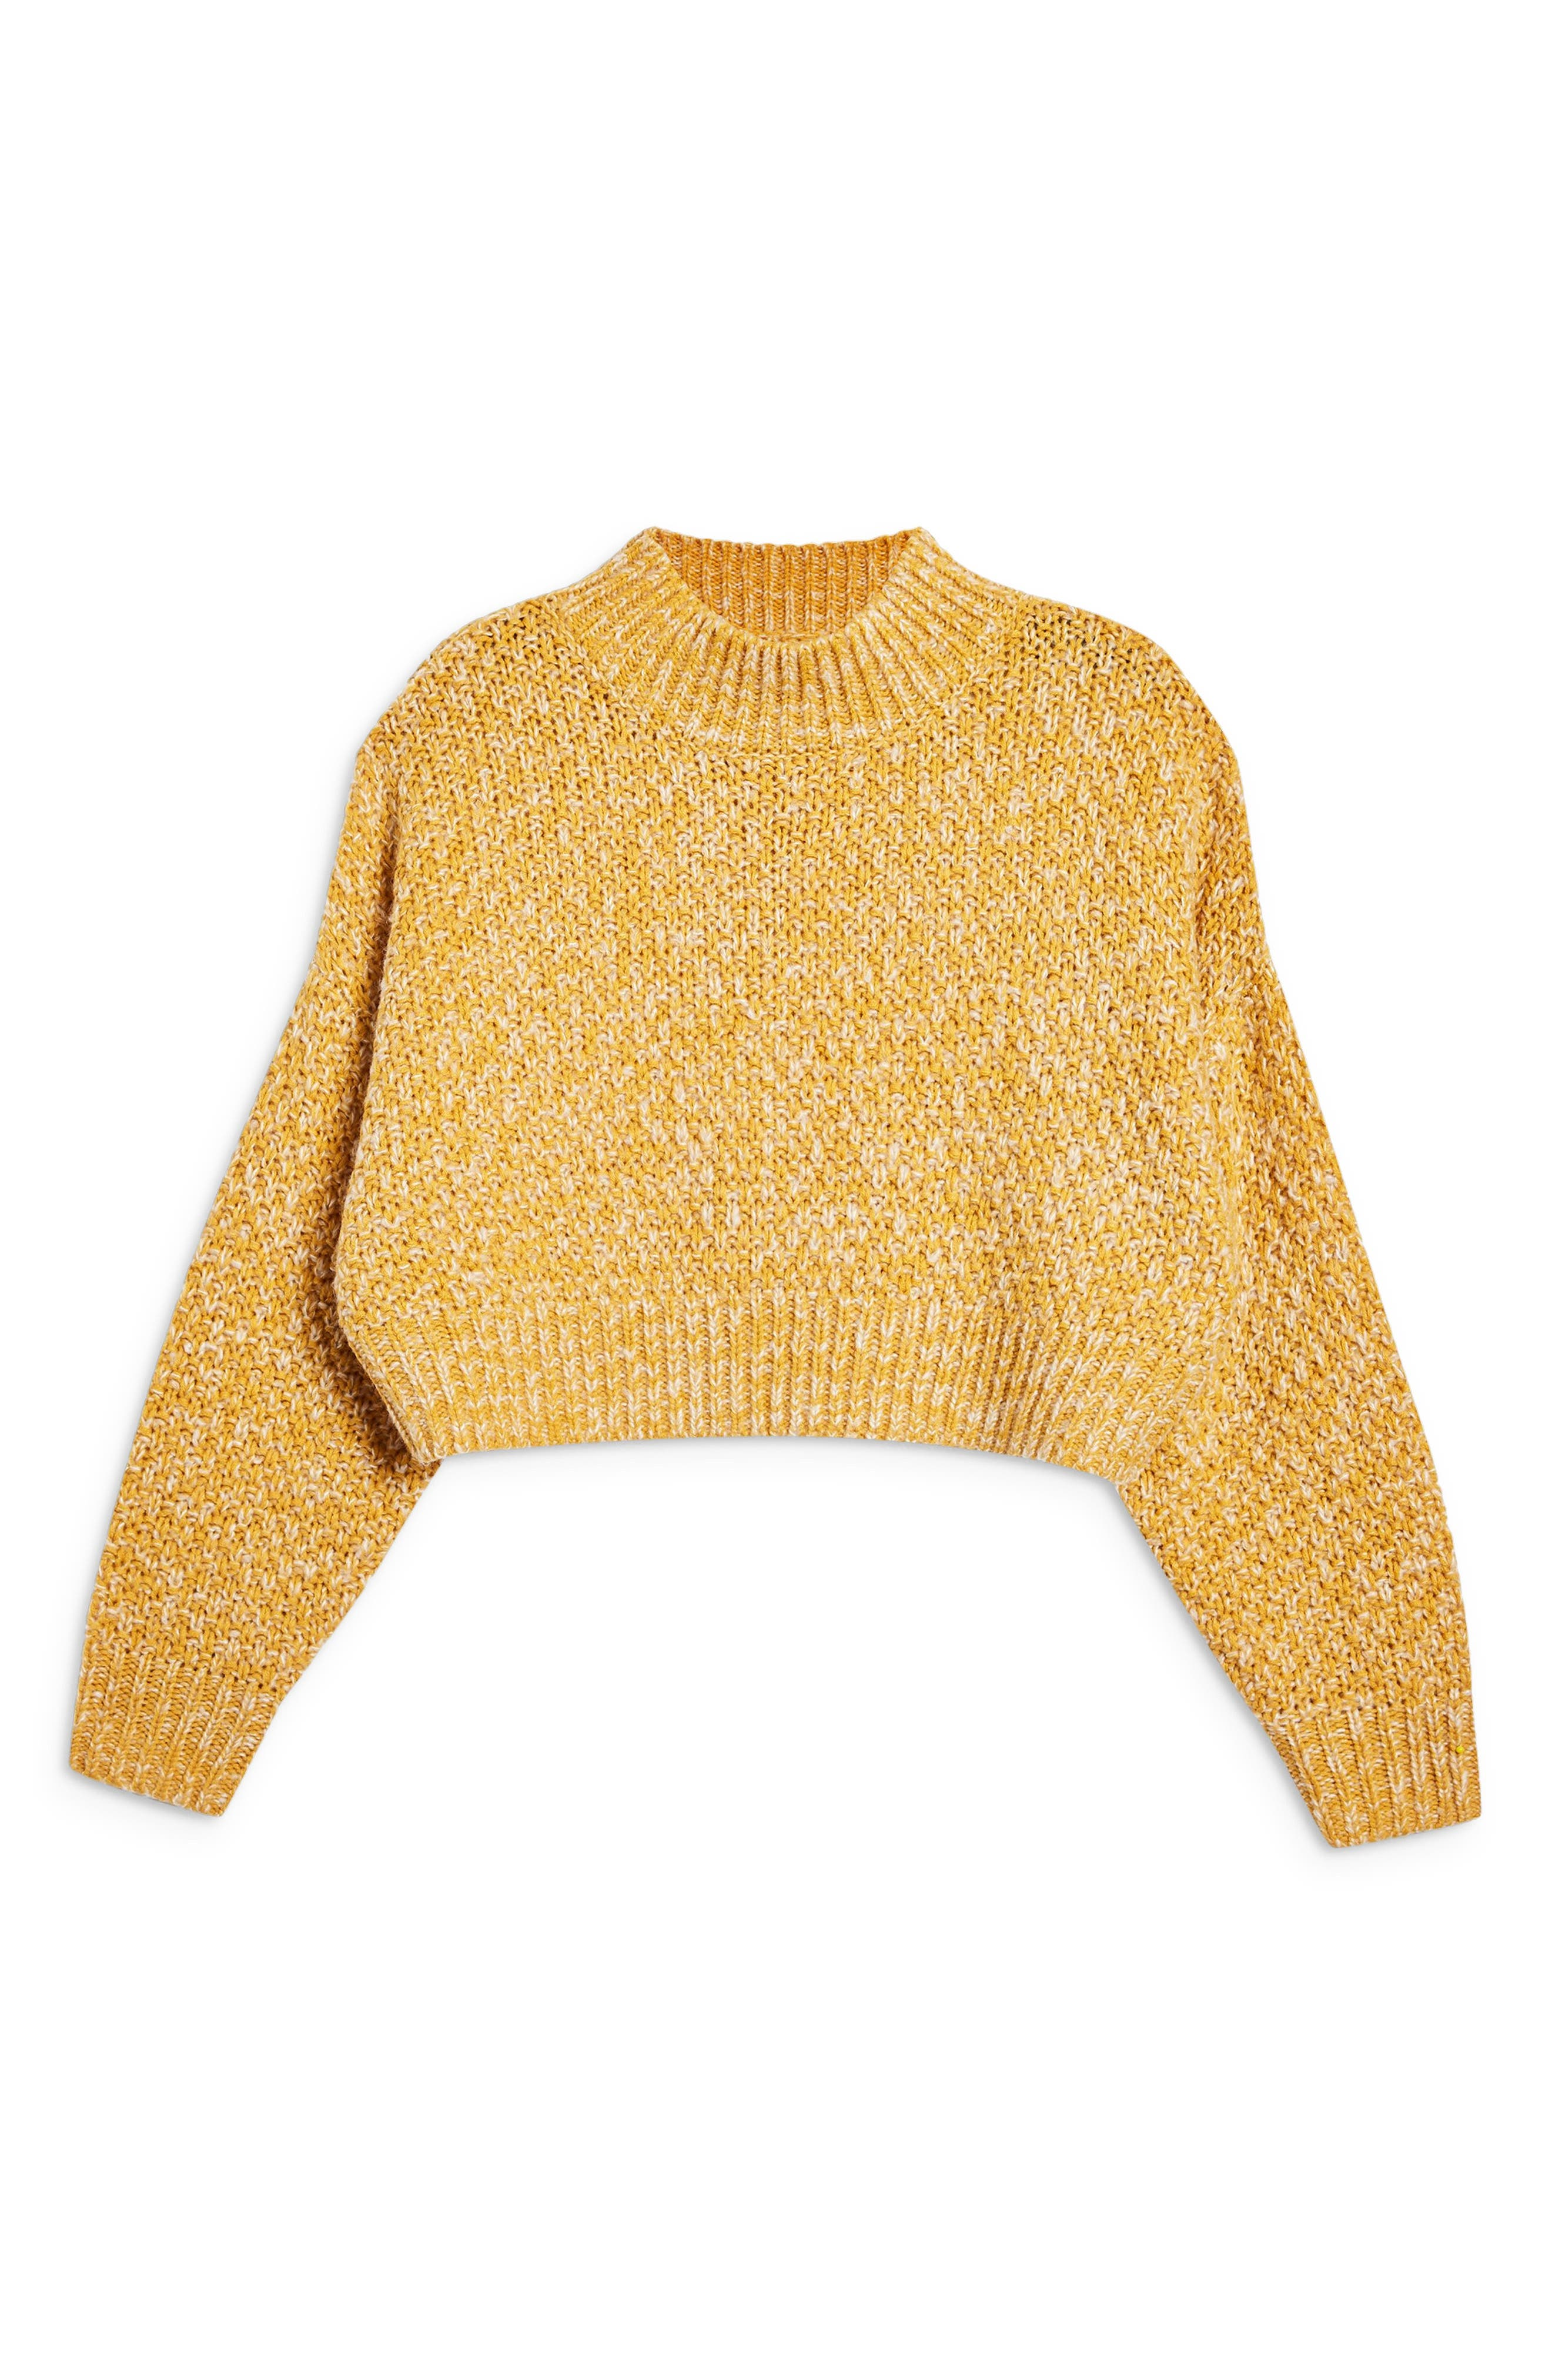 Curve Hem Crop Sweater,                             Alternate thumbnail 3, color,                             MUSTARD